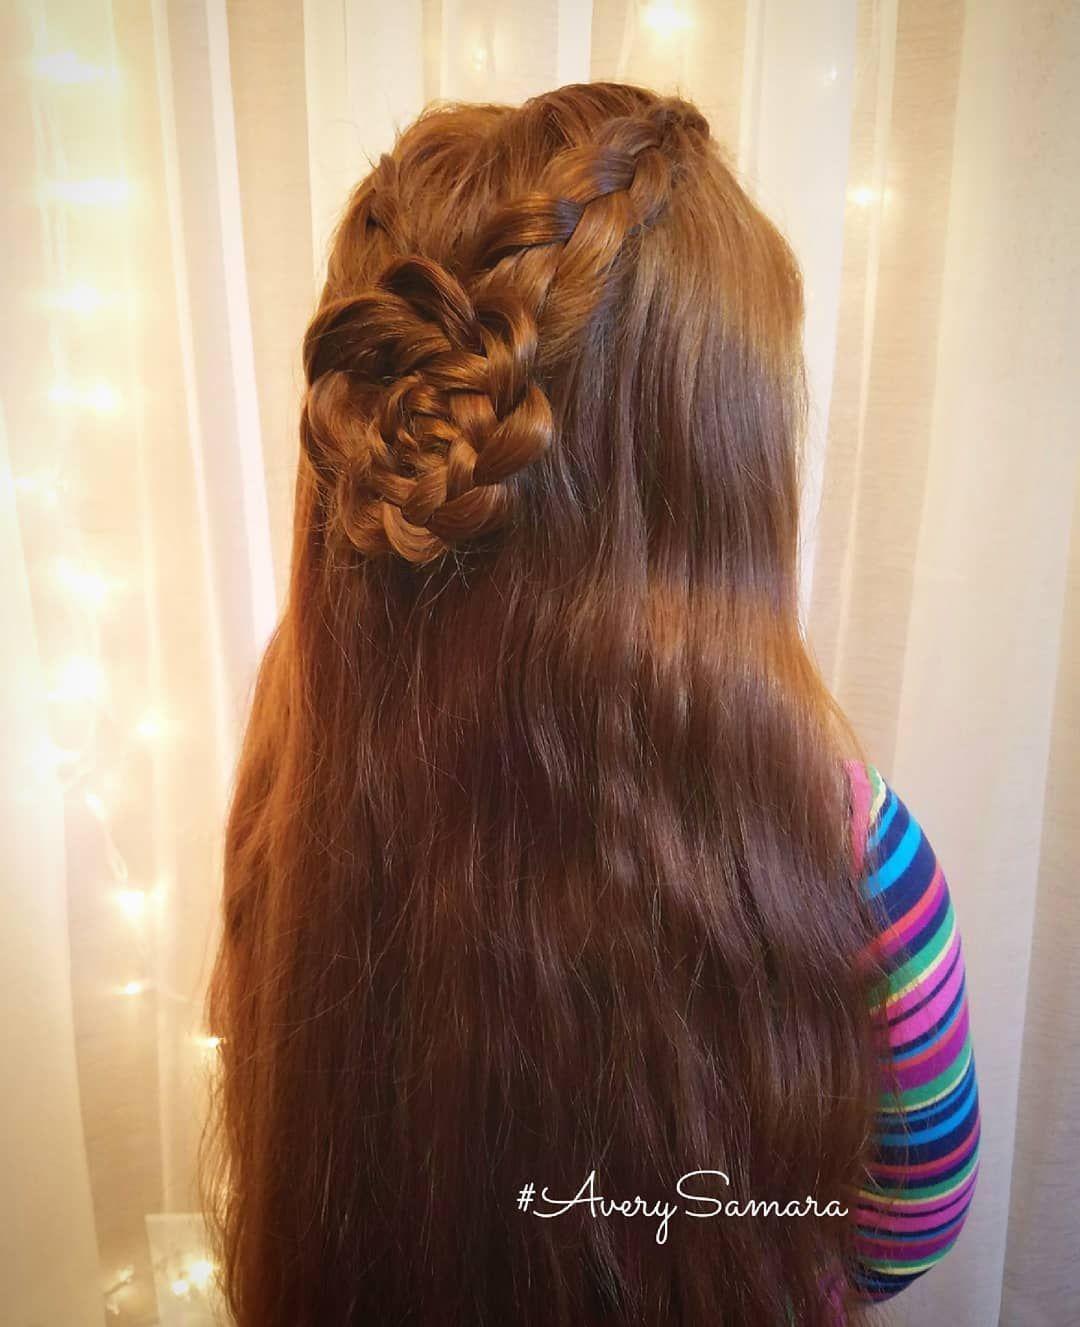 Lace braid rosette in hair wedding hair flower girl hair